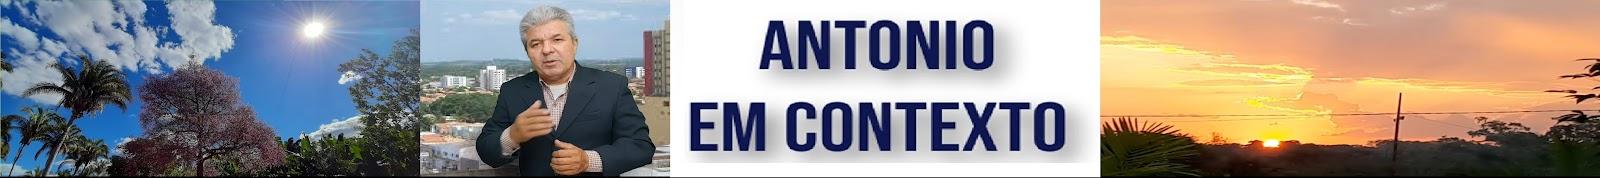 ANTONIO EM CONTEXTO